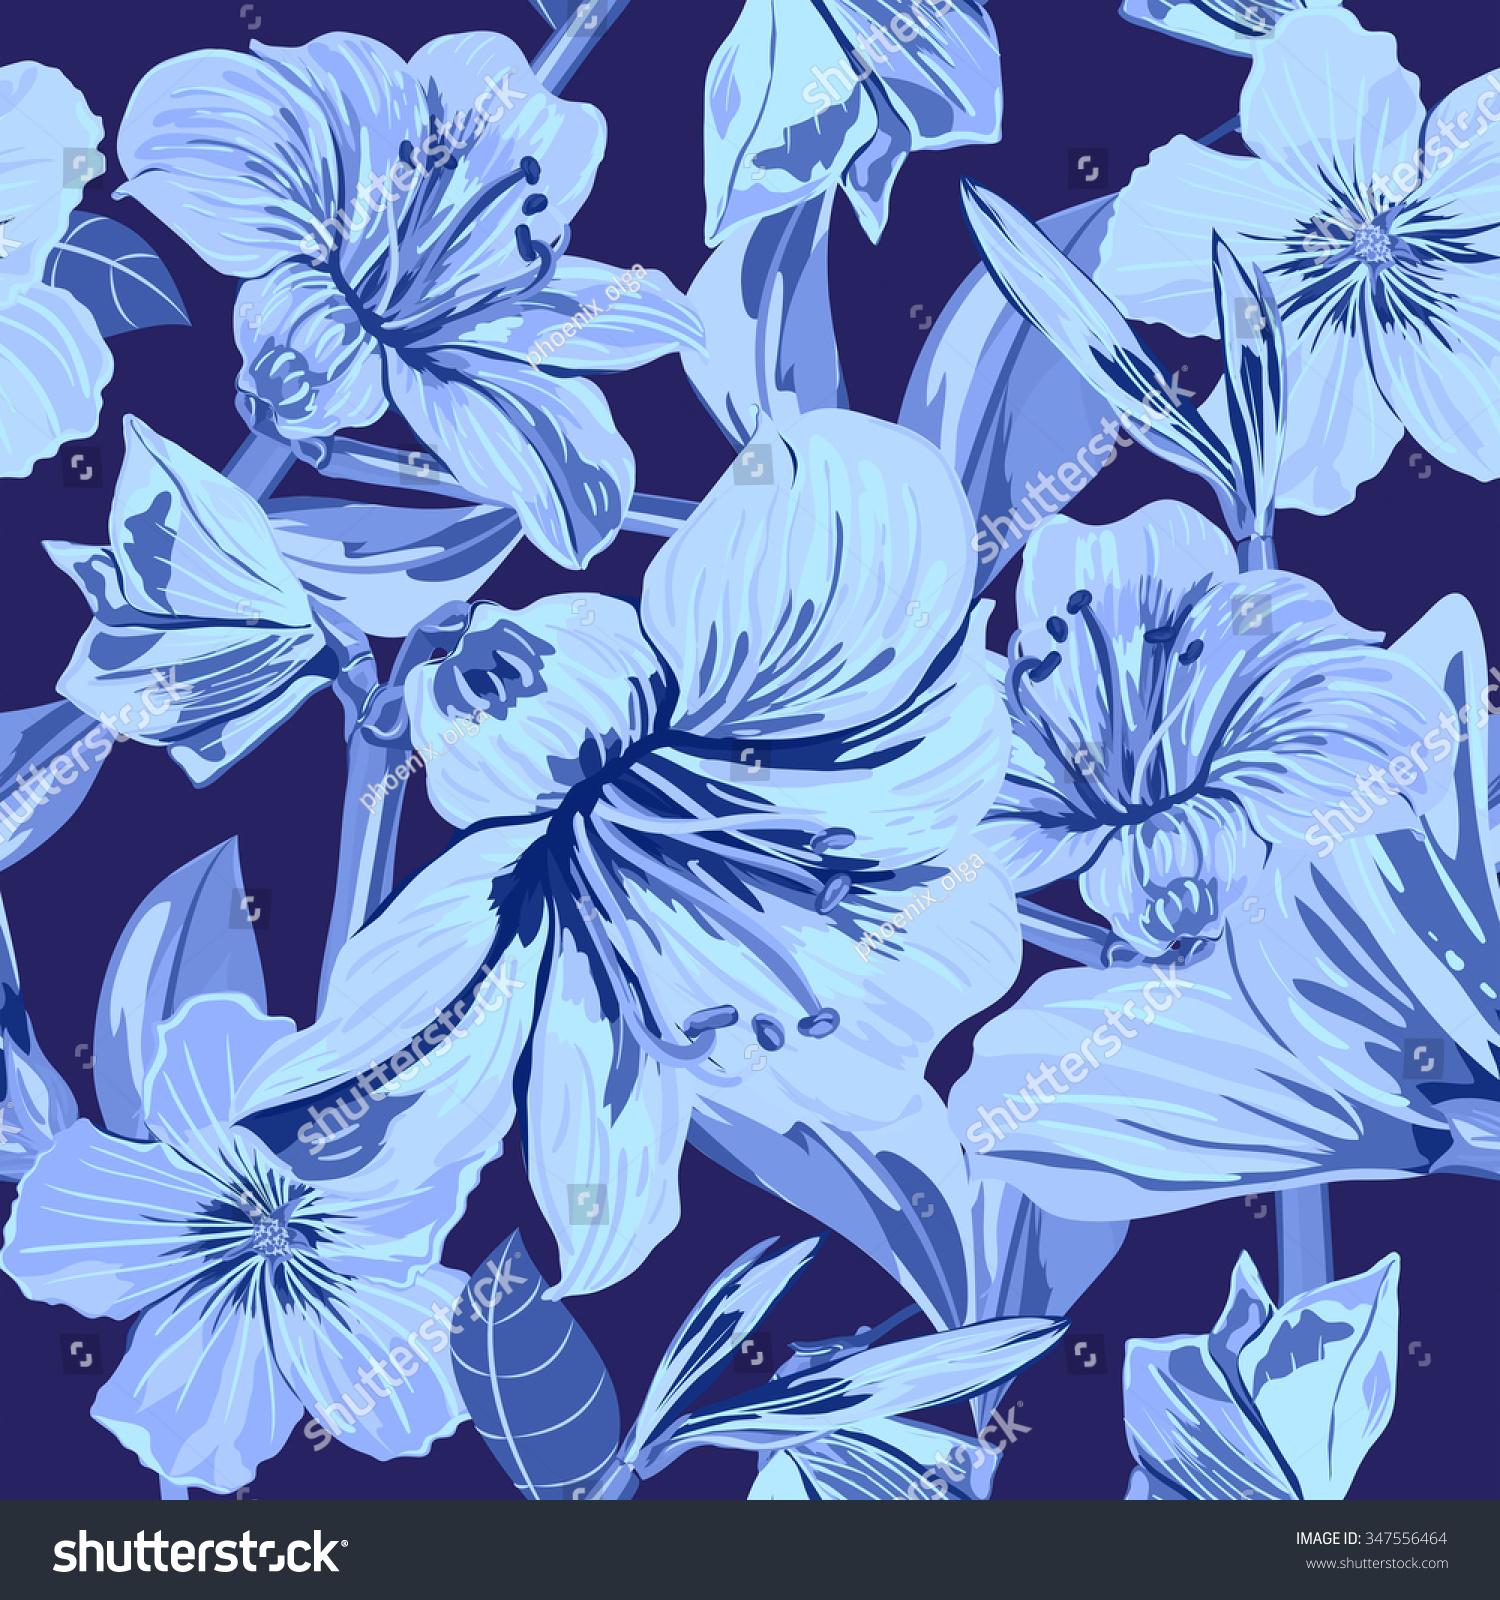 Vector Seamless Flower Pattern Flower Pattern With Blue Flowers